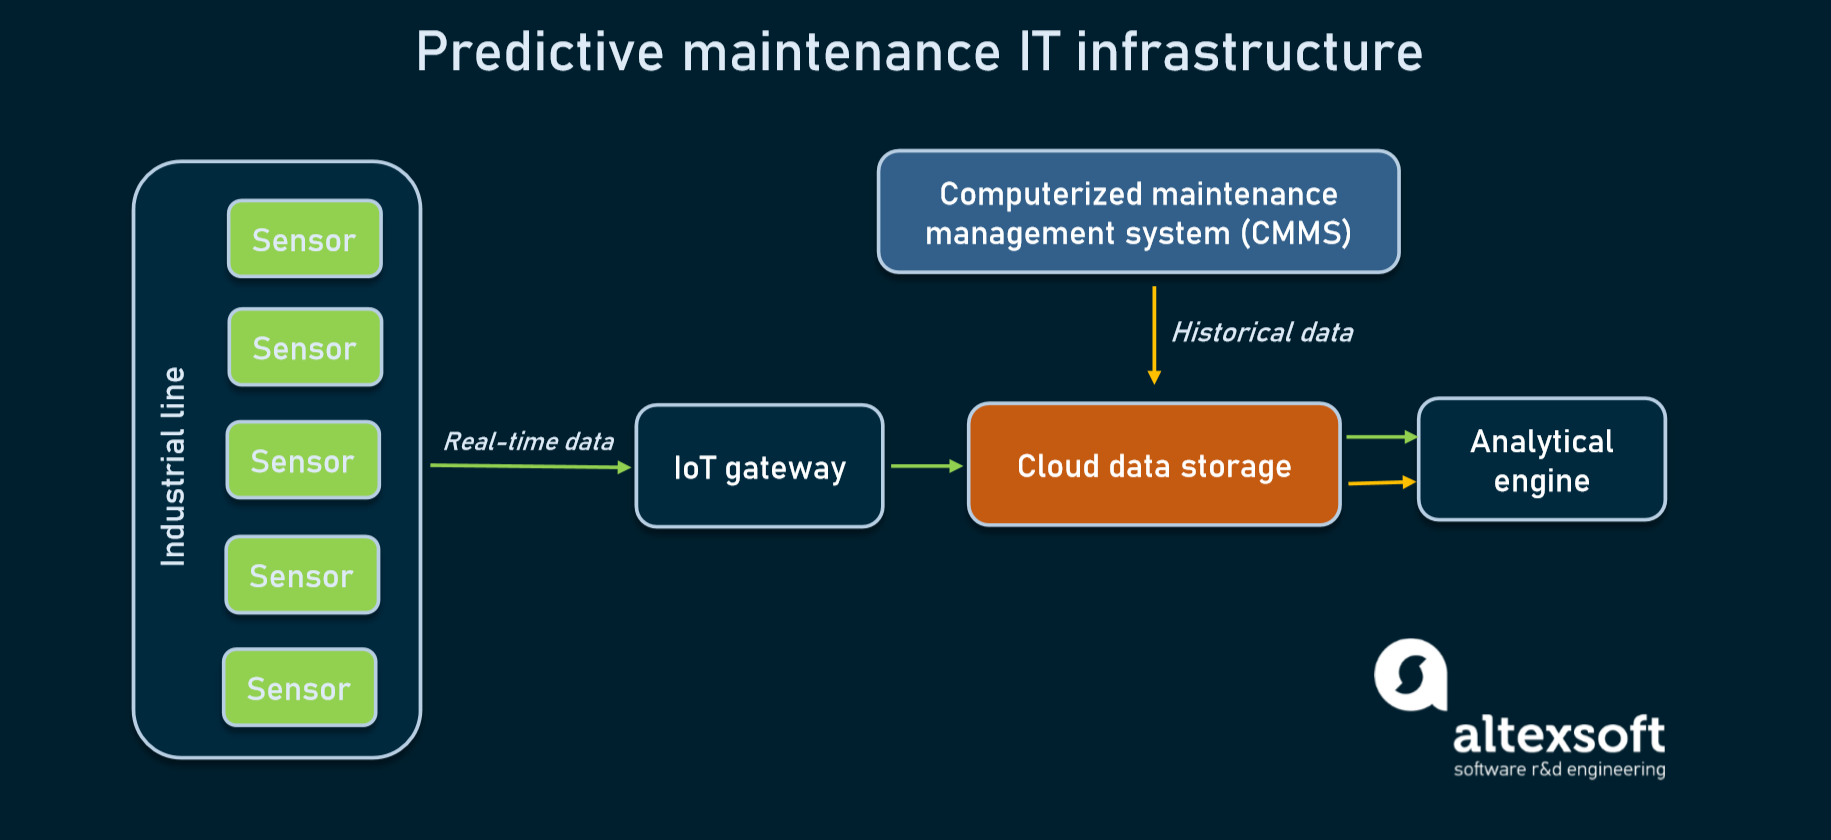 Main hardware and software components powering predictive maintenance